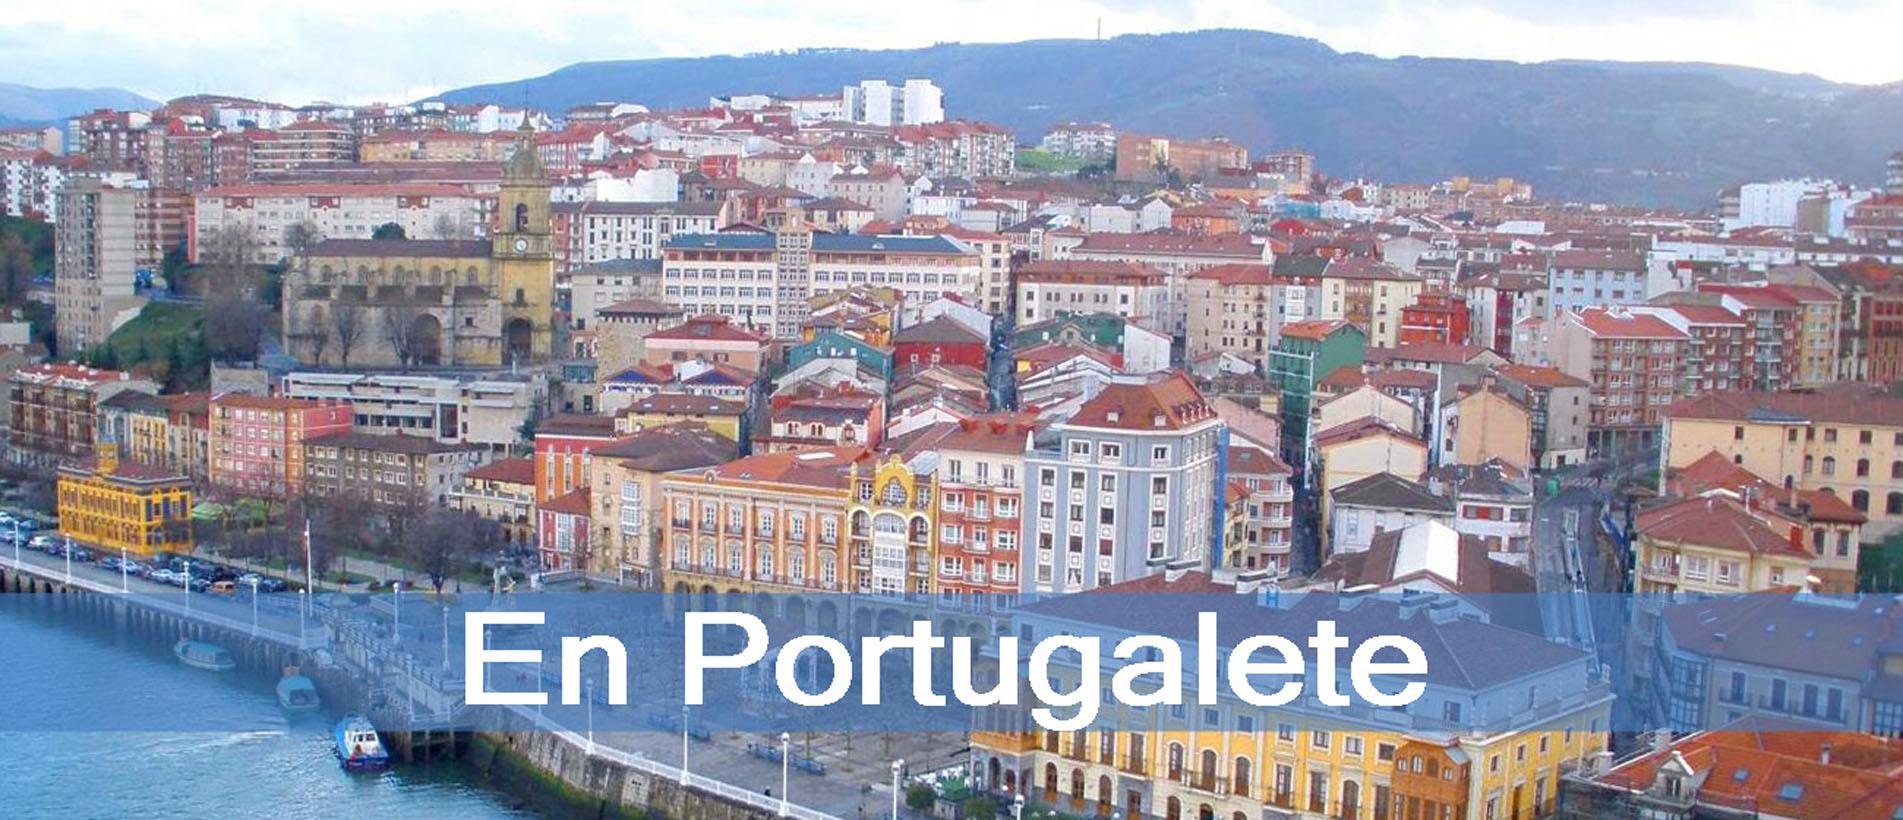 Dentista Portugalete